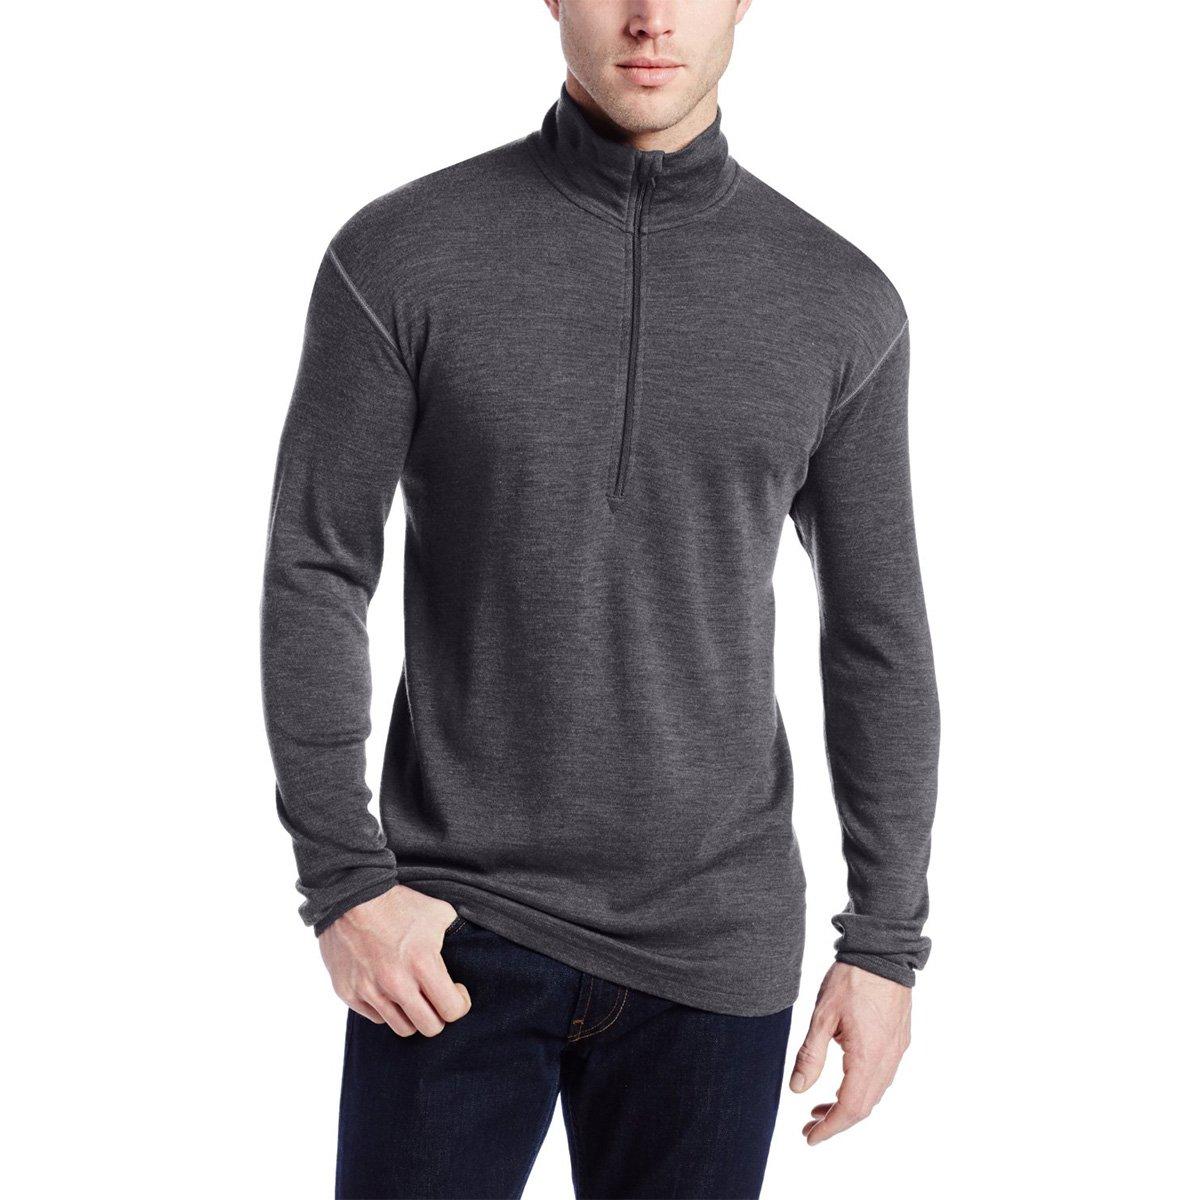 Minus33 Merino Wool Men's Isolation Midweight 1/4 Zip, Charcoal Grey, X-Large